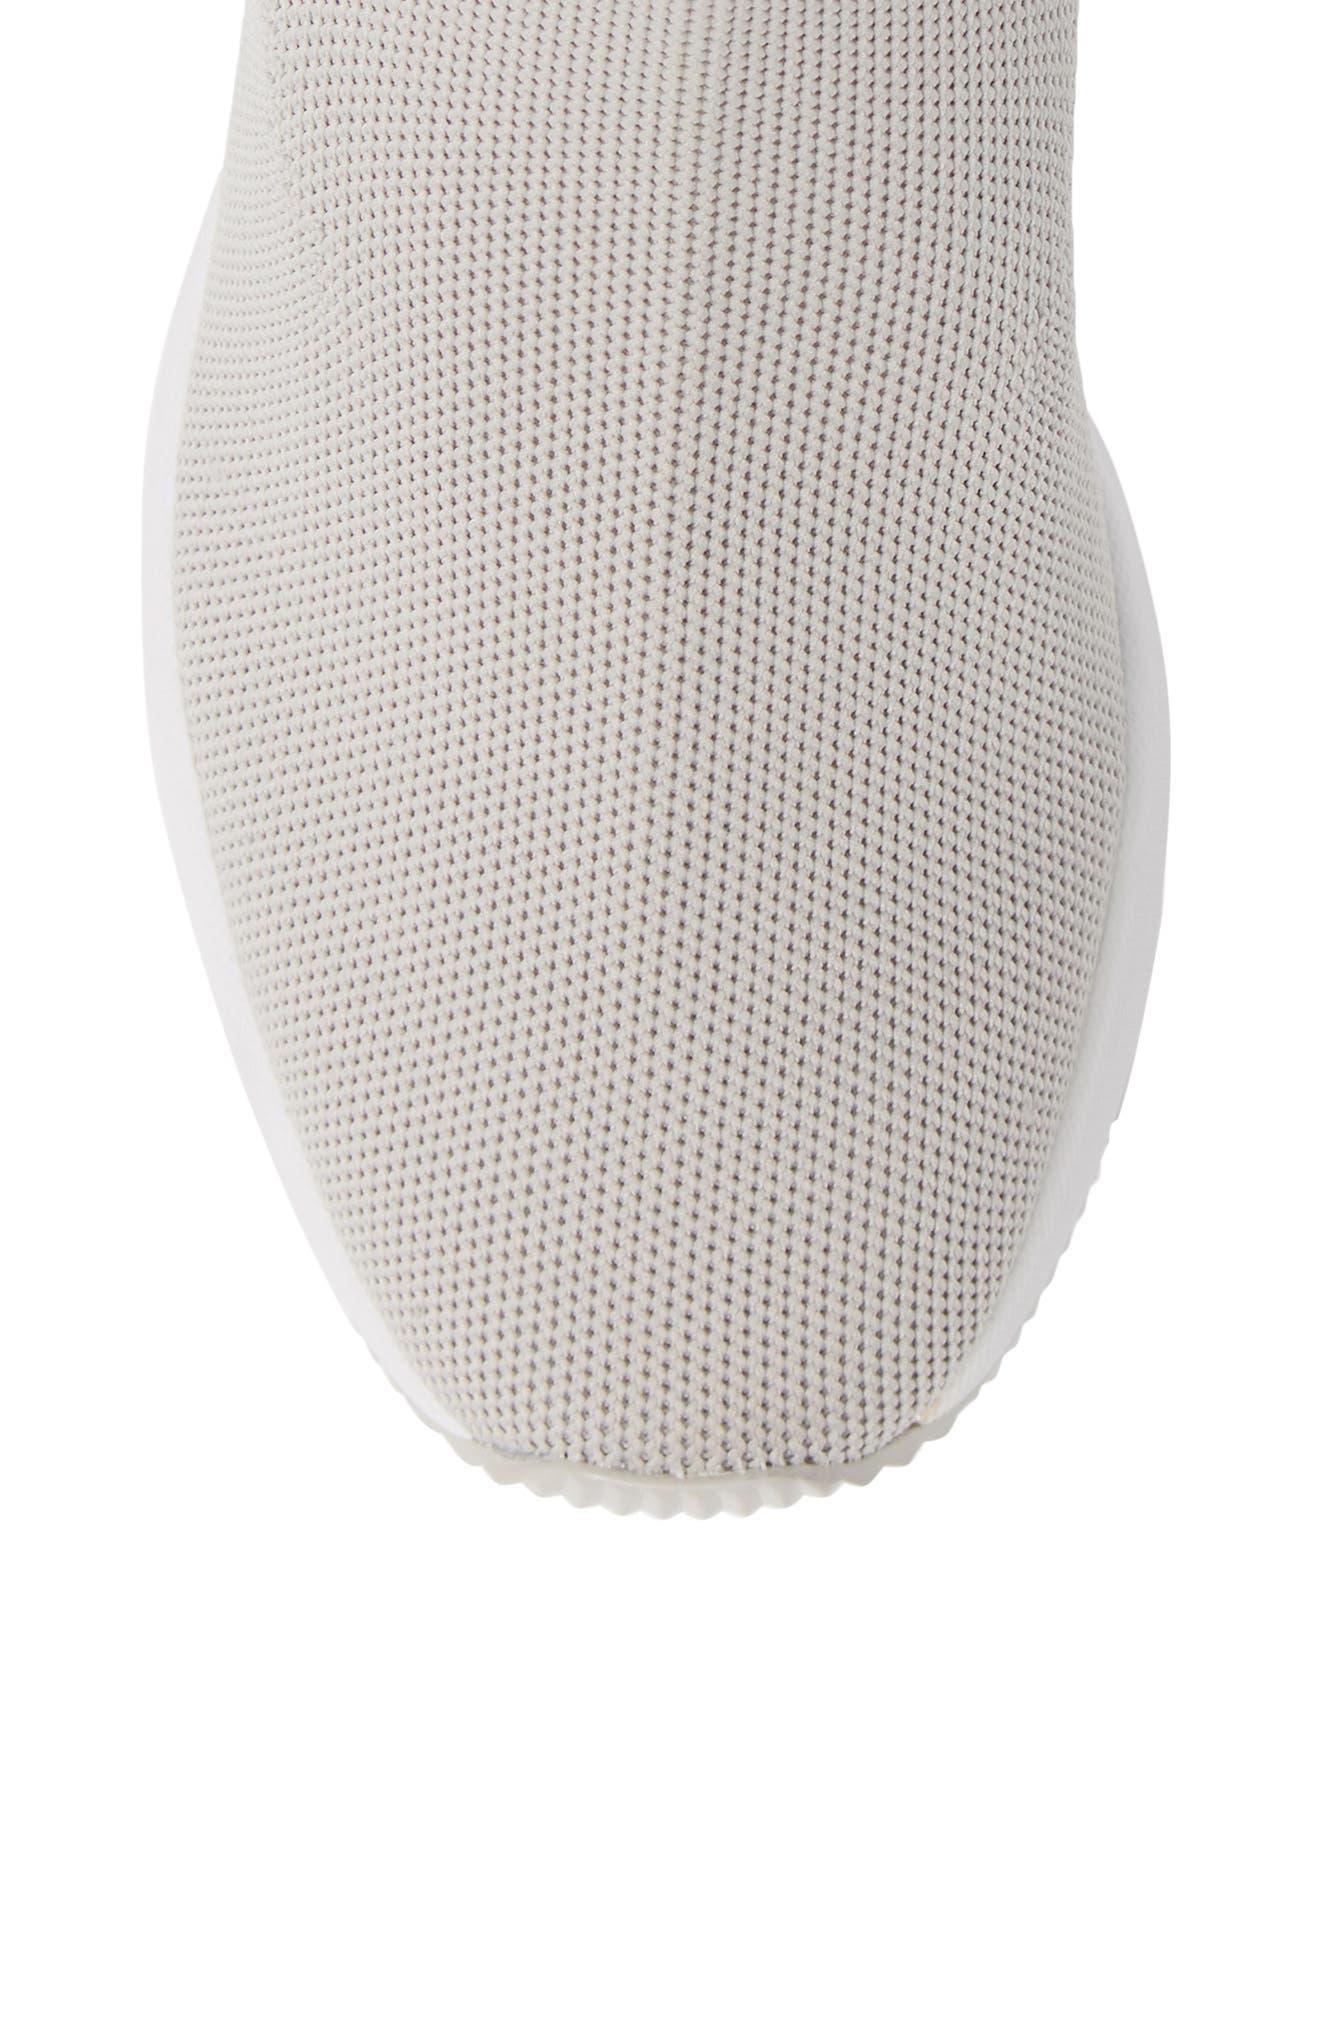 Skyler Knit Bootie,                             Alternate thumbnail 4, color,                             Aluminum/ Silver Knit Fabric